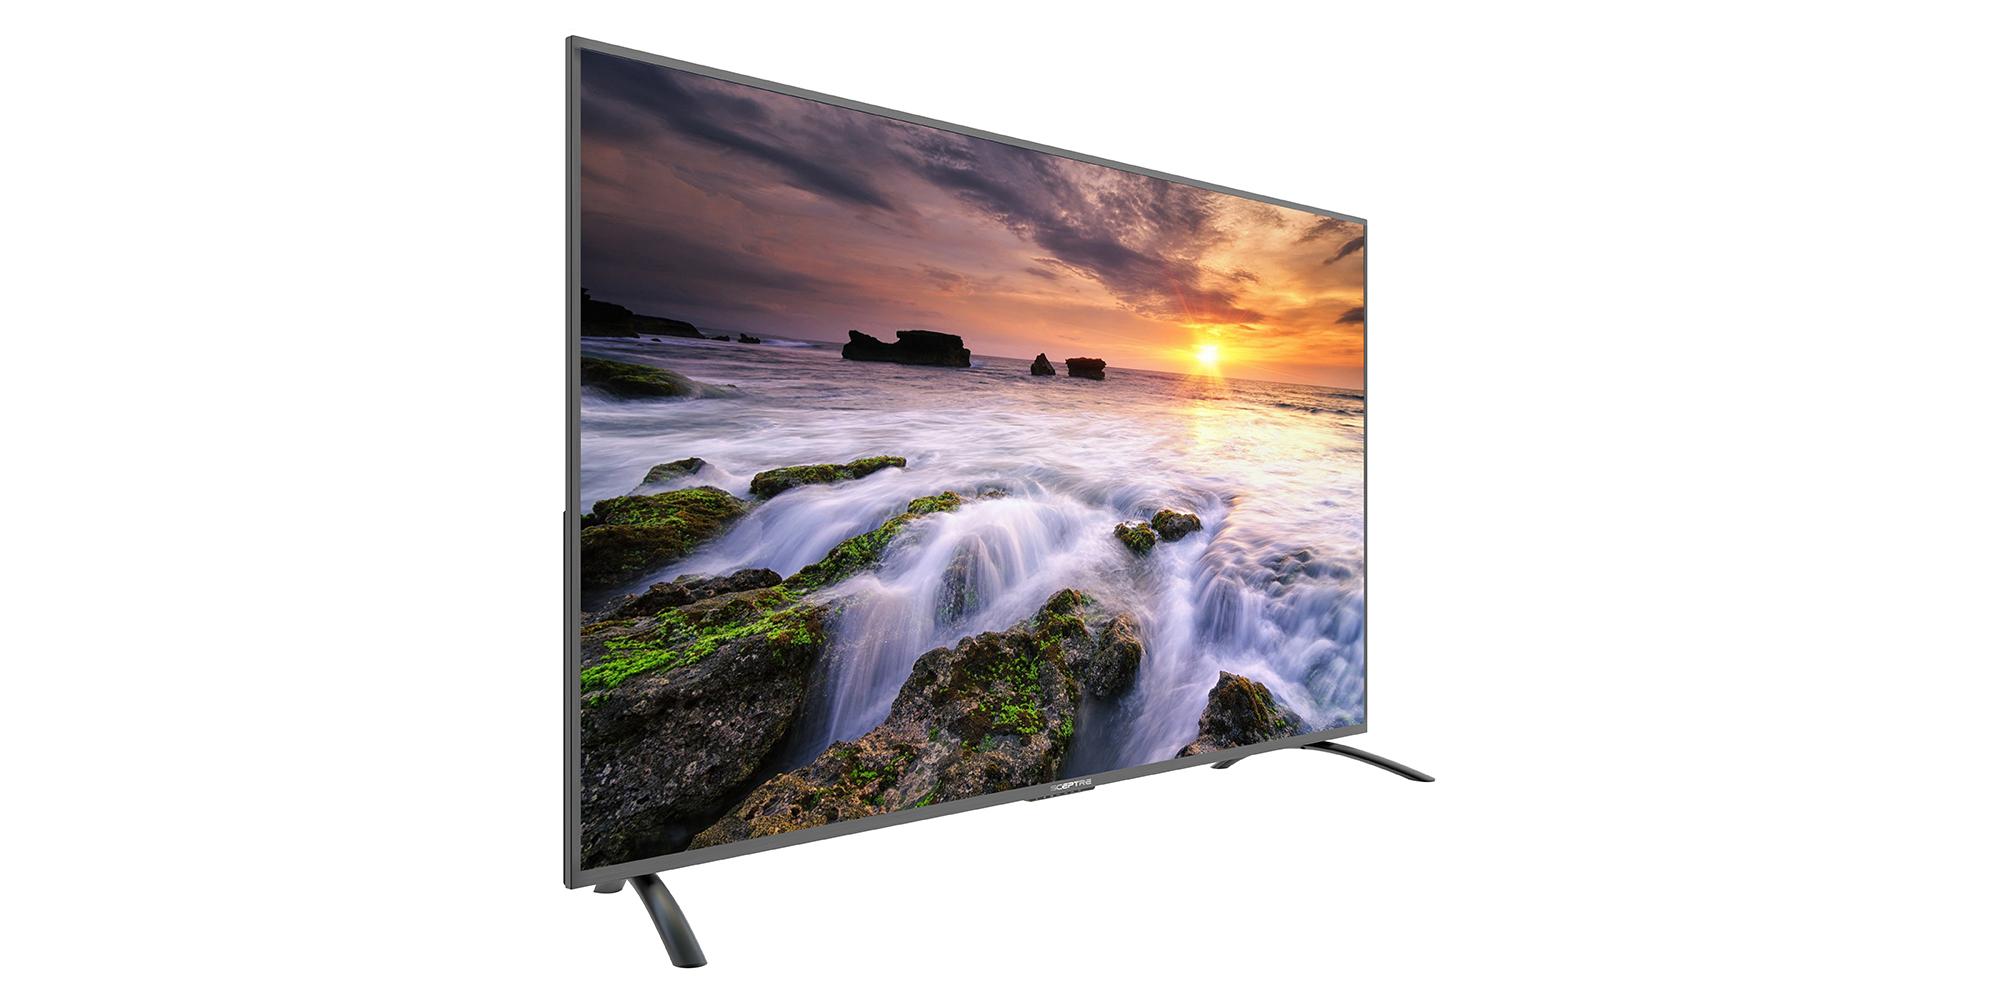 Walmart has the massive Sceptre 75-inch 4K UHDTV for $900 (Reg. $1,300+)